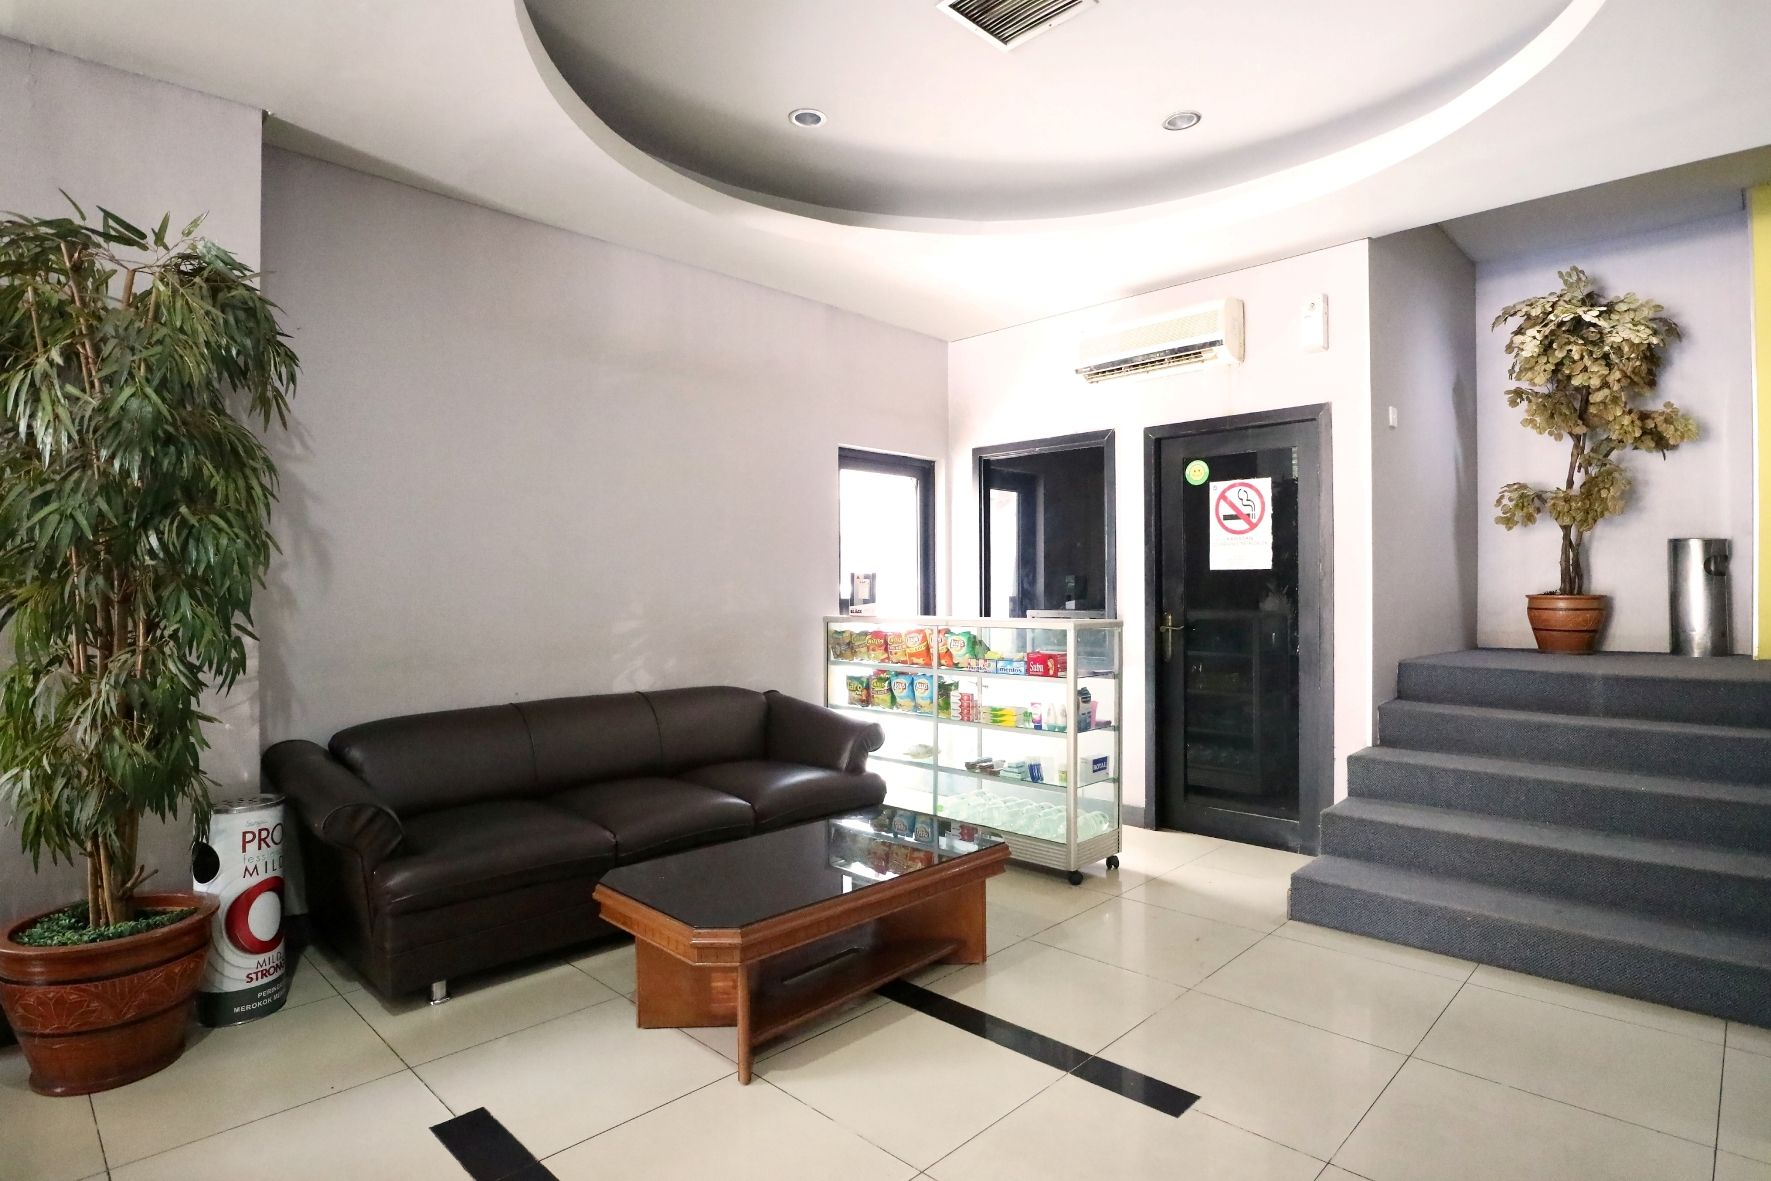 Mirah Hotel, Jakarta Pusat